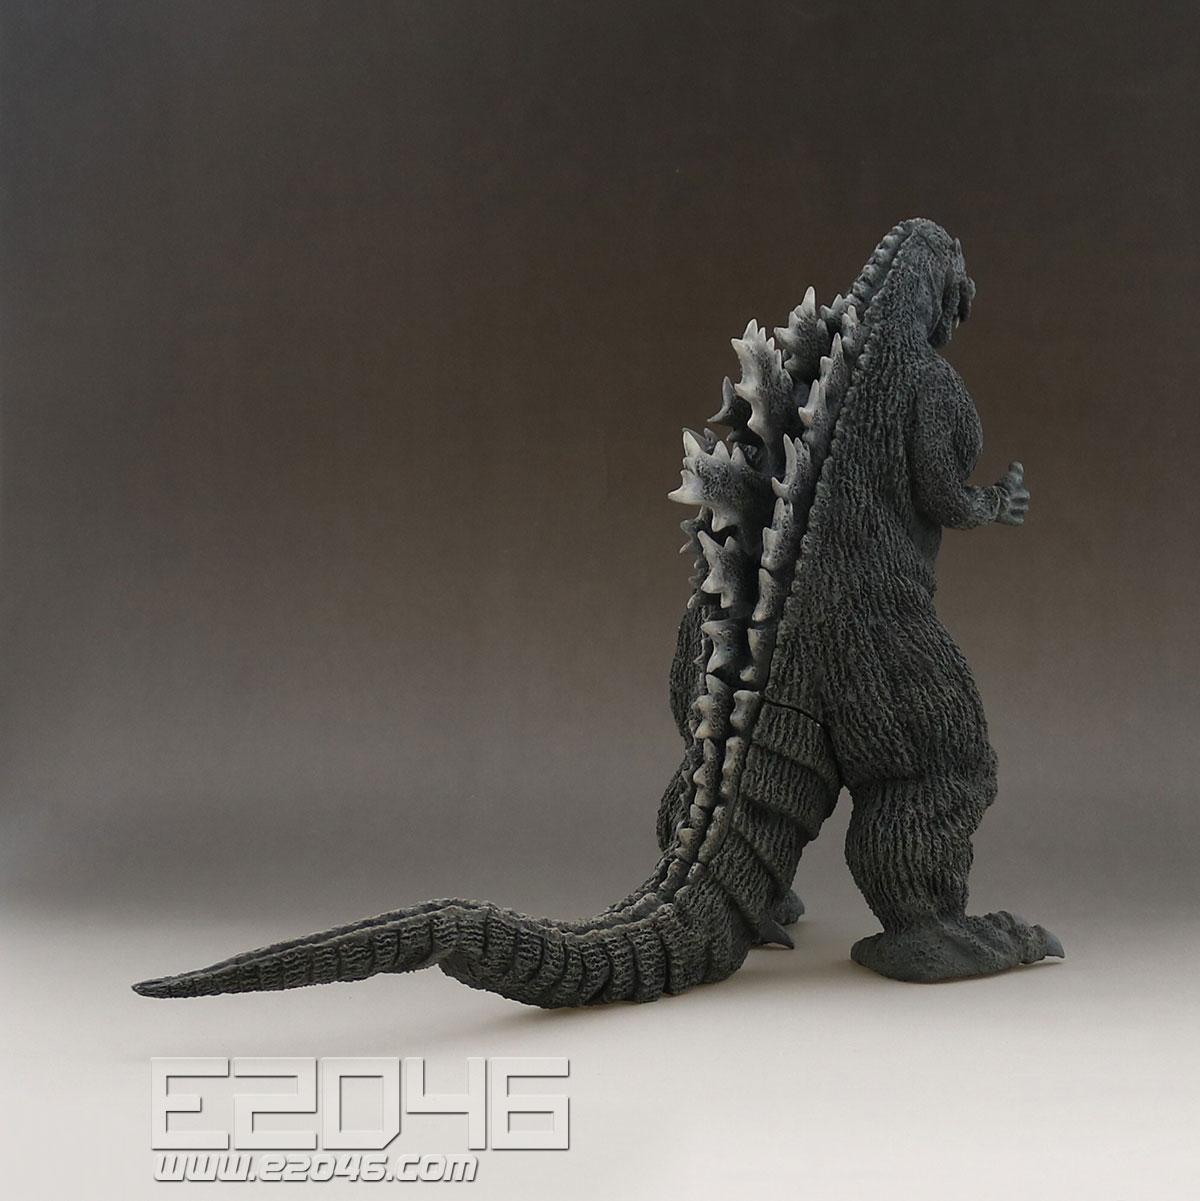 Godzilla 1954 Version (PVC)